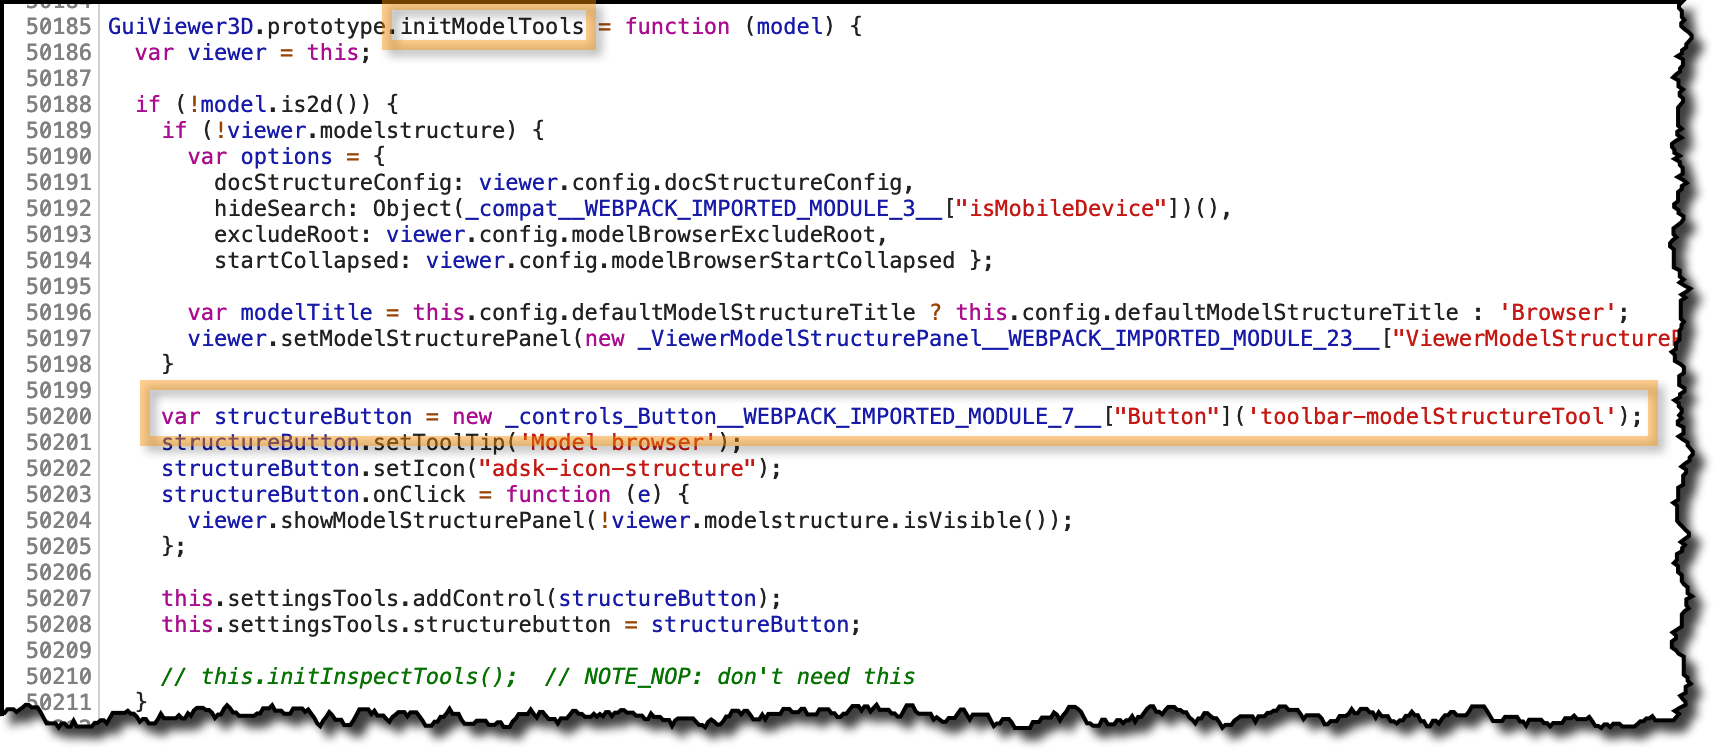 initModelTools function